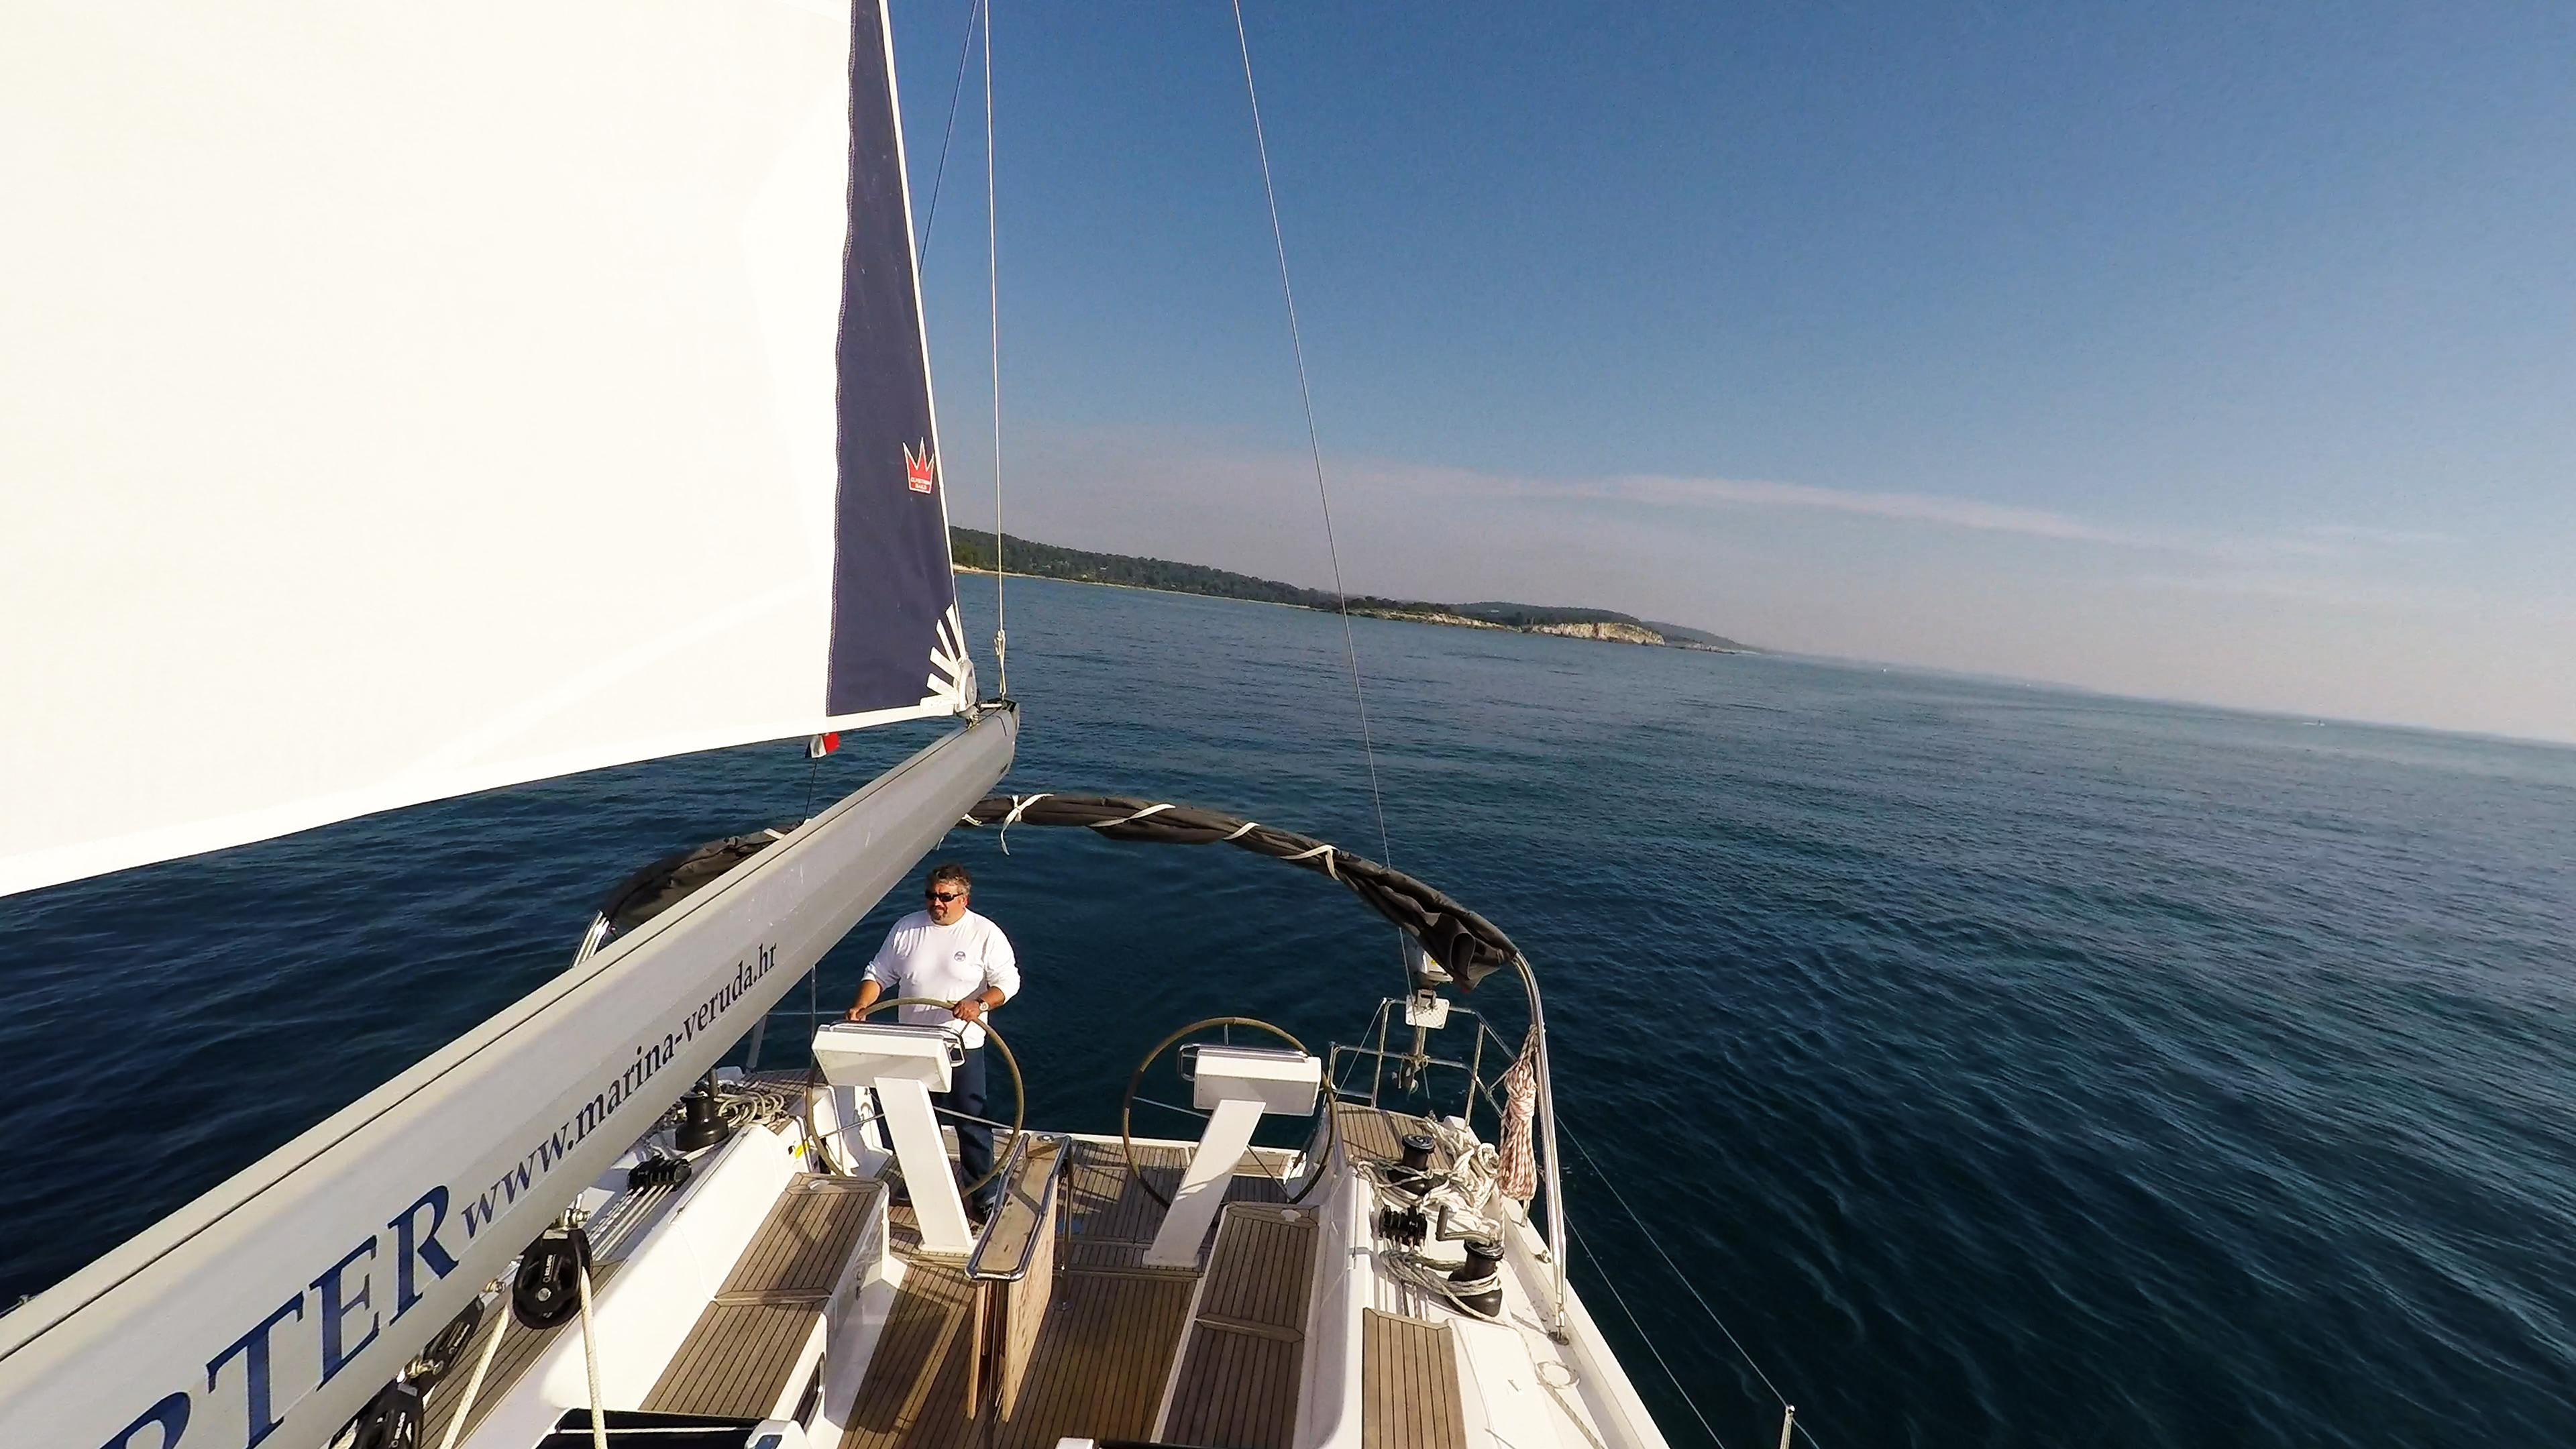 sailing yacht skipper double steering wheel boom sail sailing yacht cockpit deck sailboat